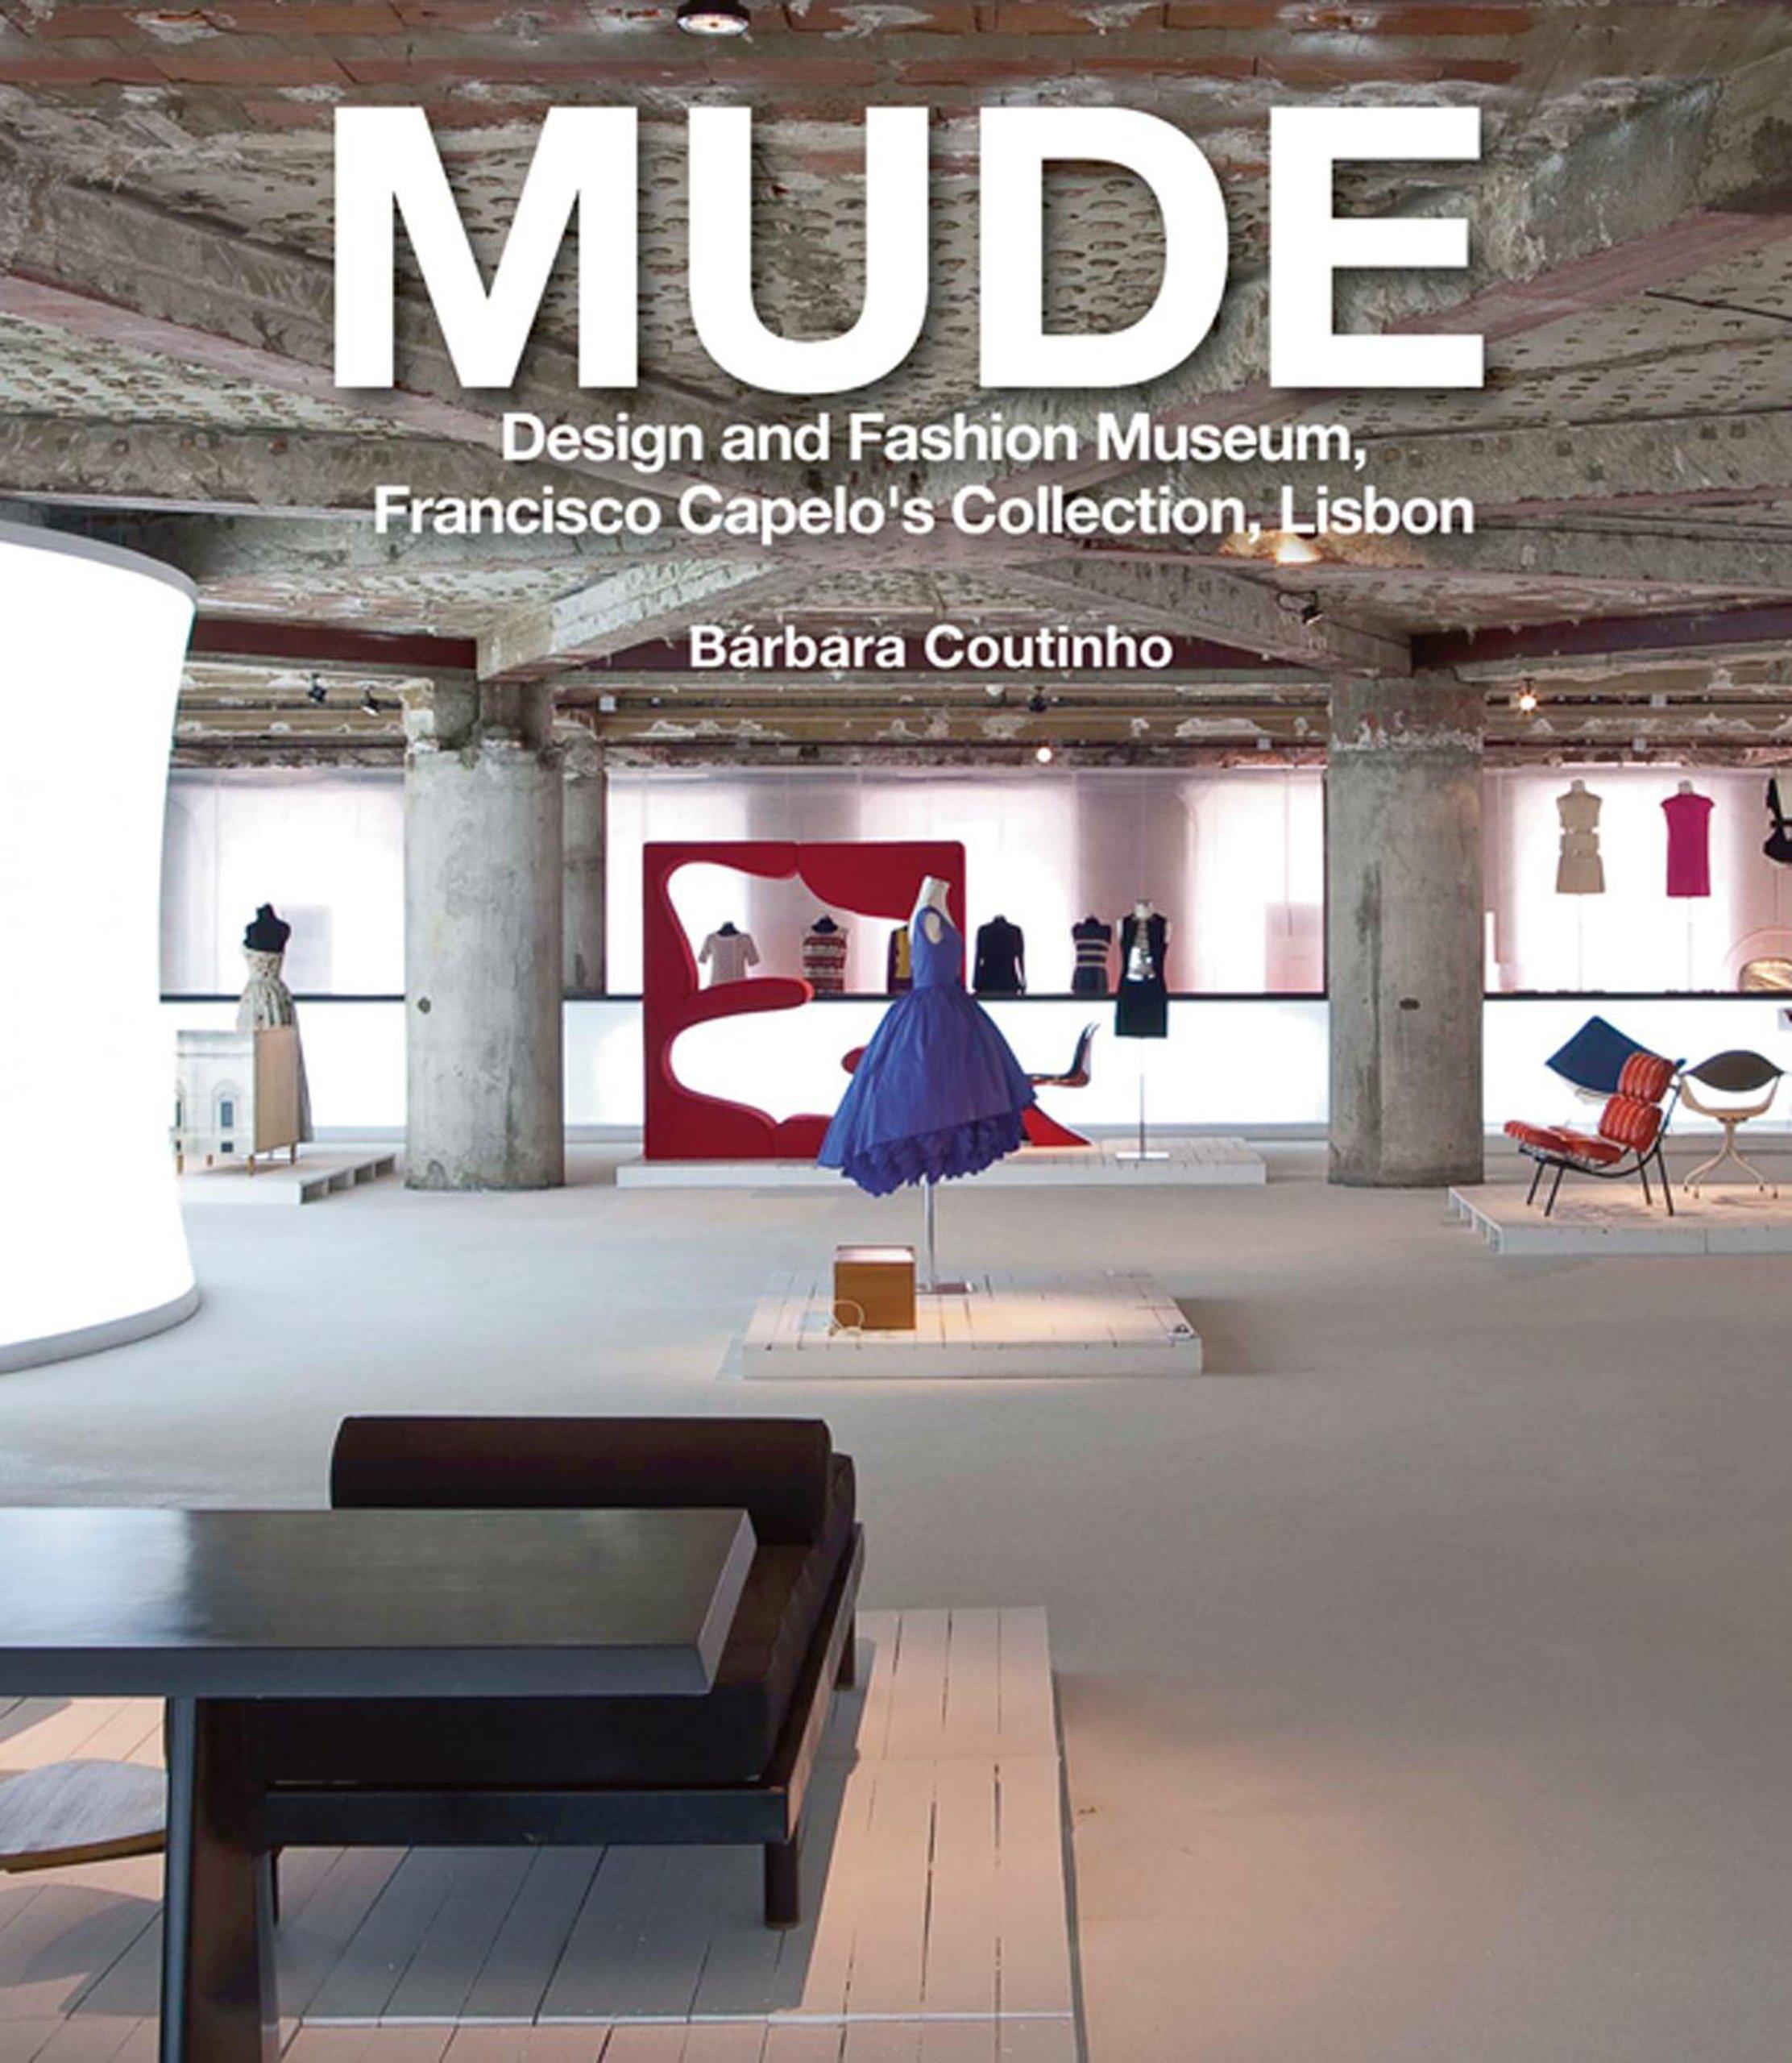 Mude Design And Fashion Museum Francisco Capelo S Collection Lisbon Coutinho Barbara 9781857598414 Amazon Com Books